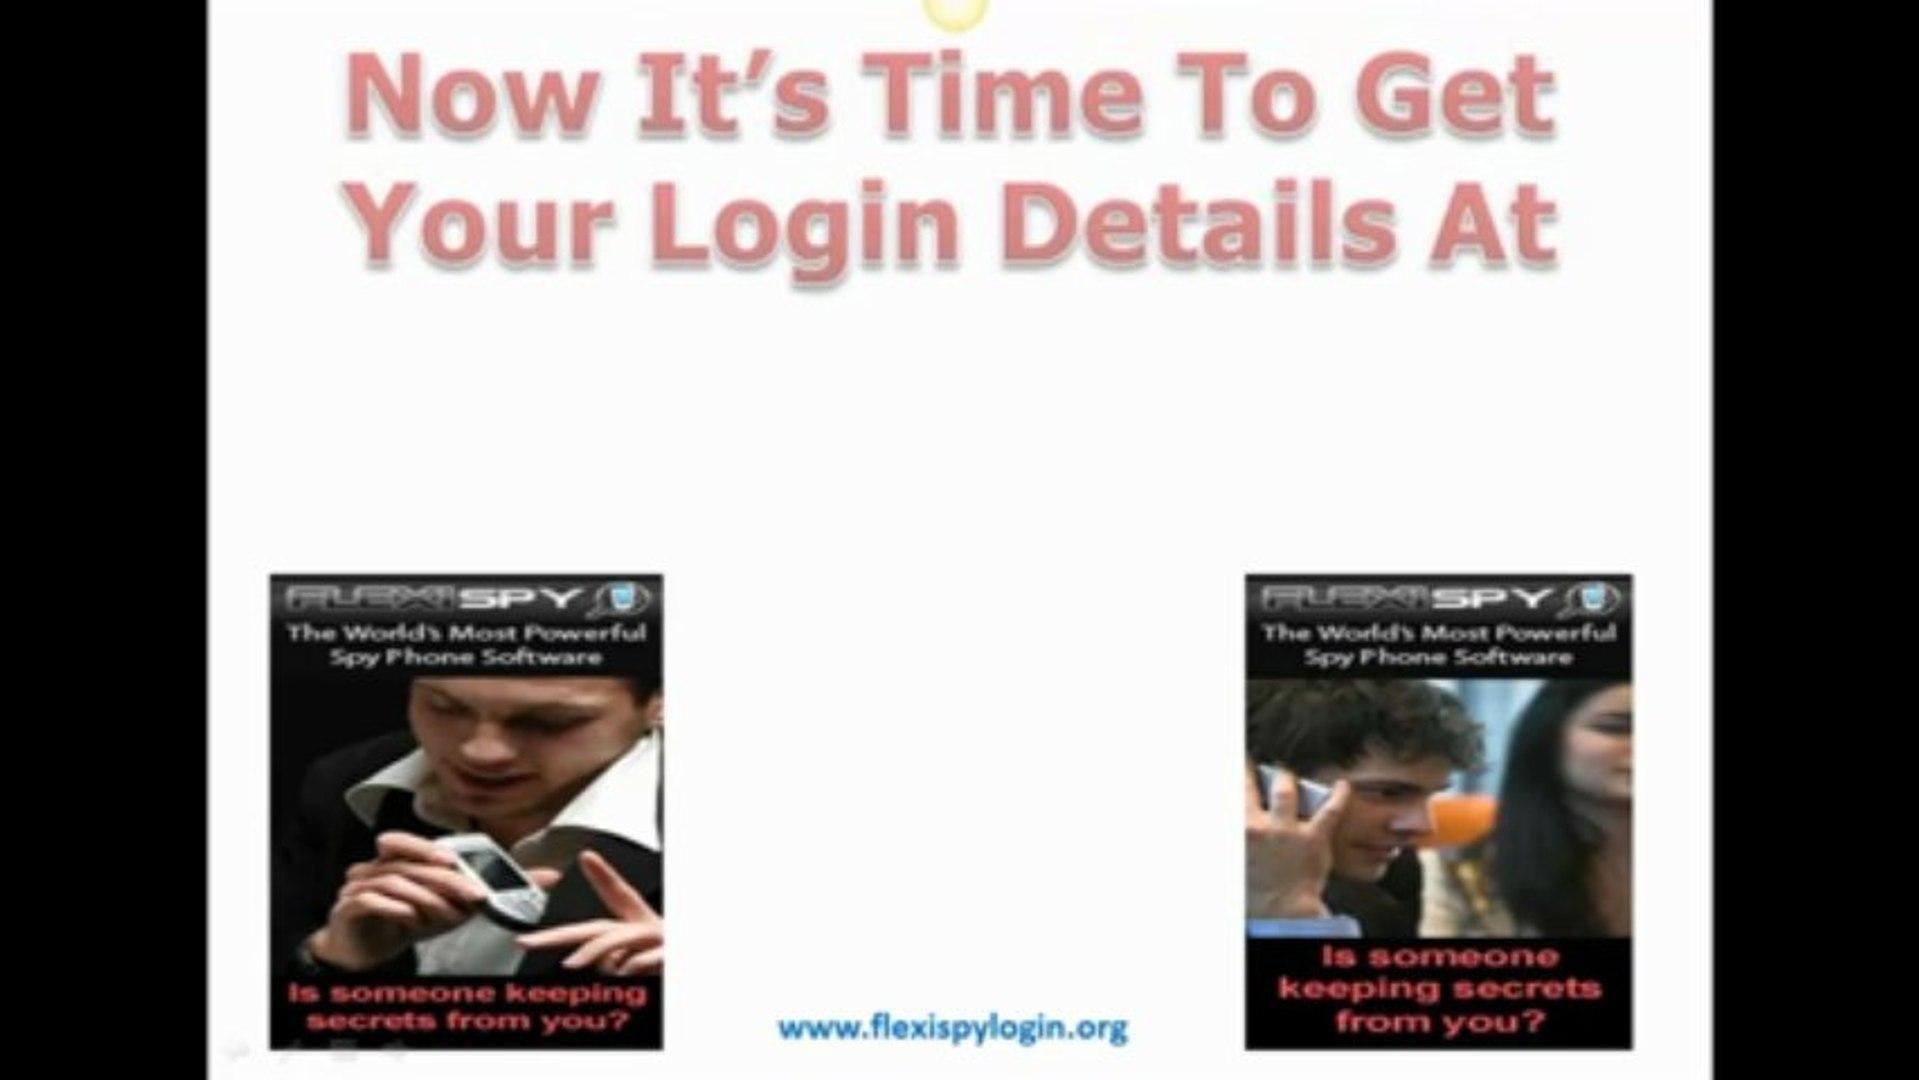 Flexispy Login - How To Get Flexispy Login Details